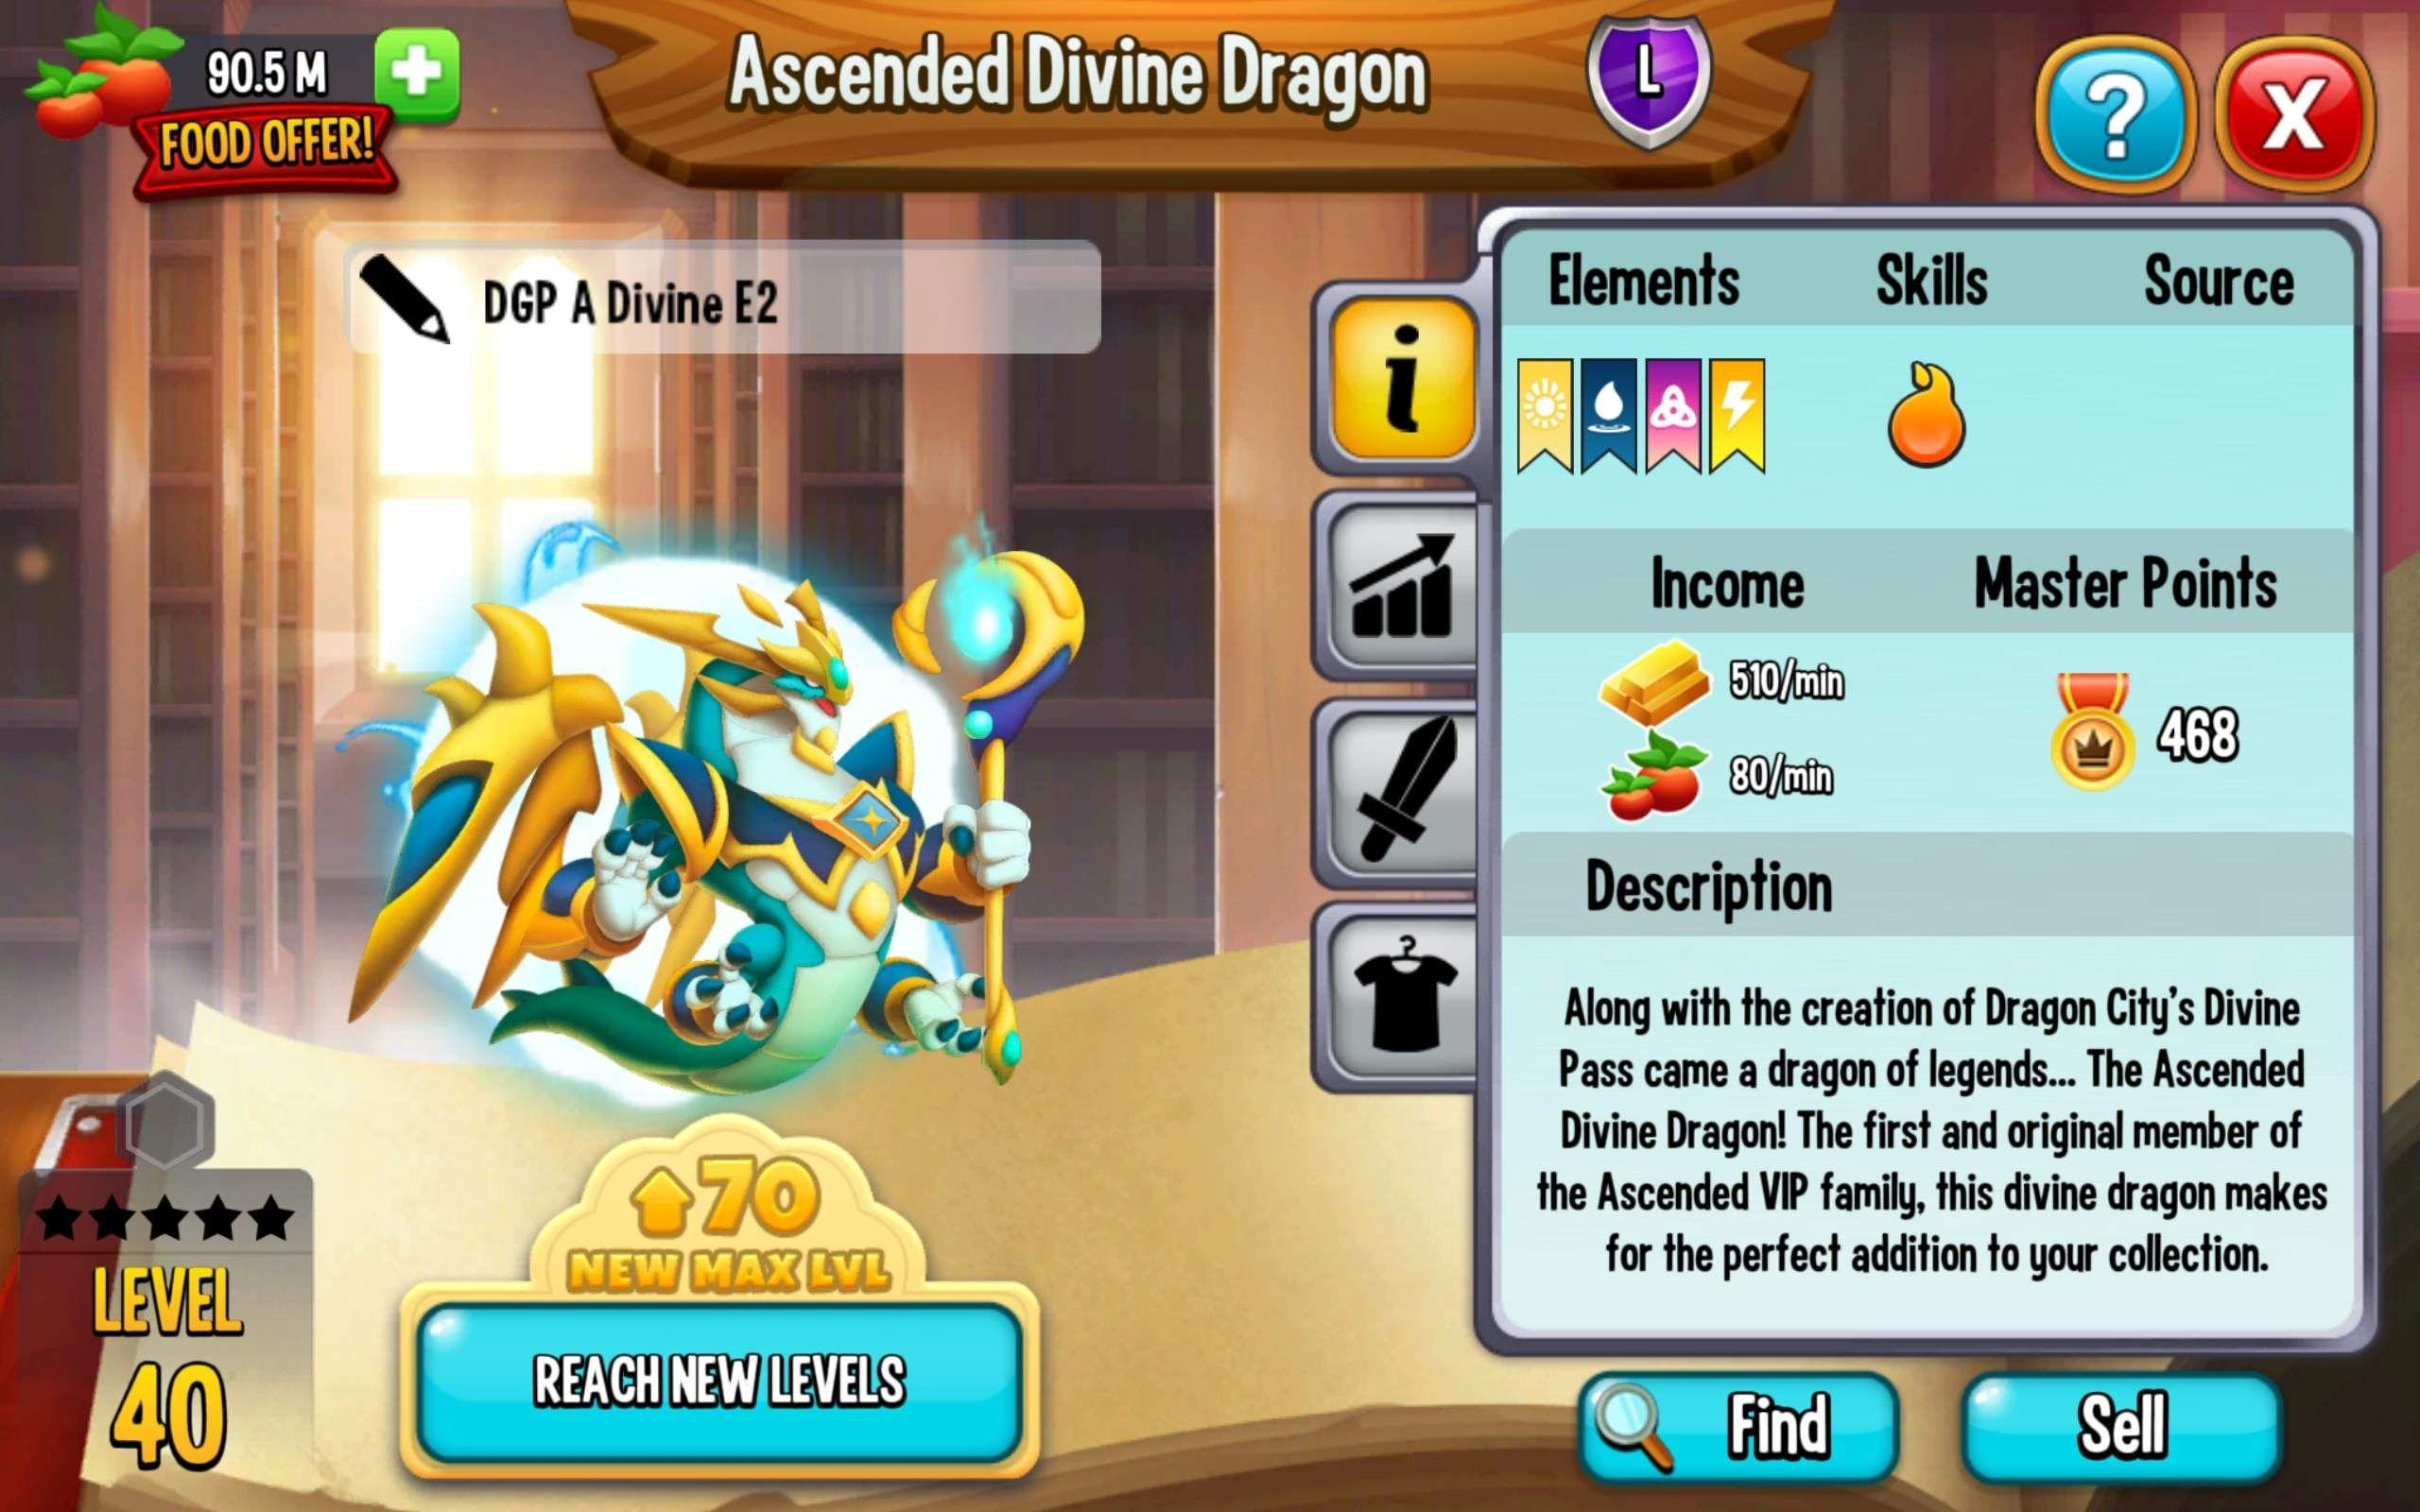 0_1628960922761_DragonCity_2021-08-14-13-06-12.jpg